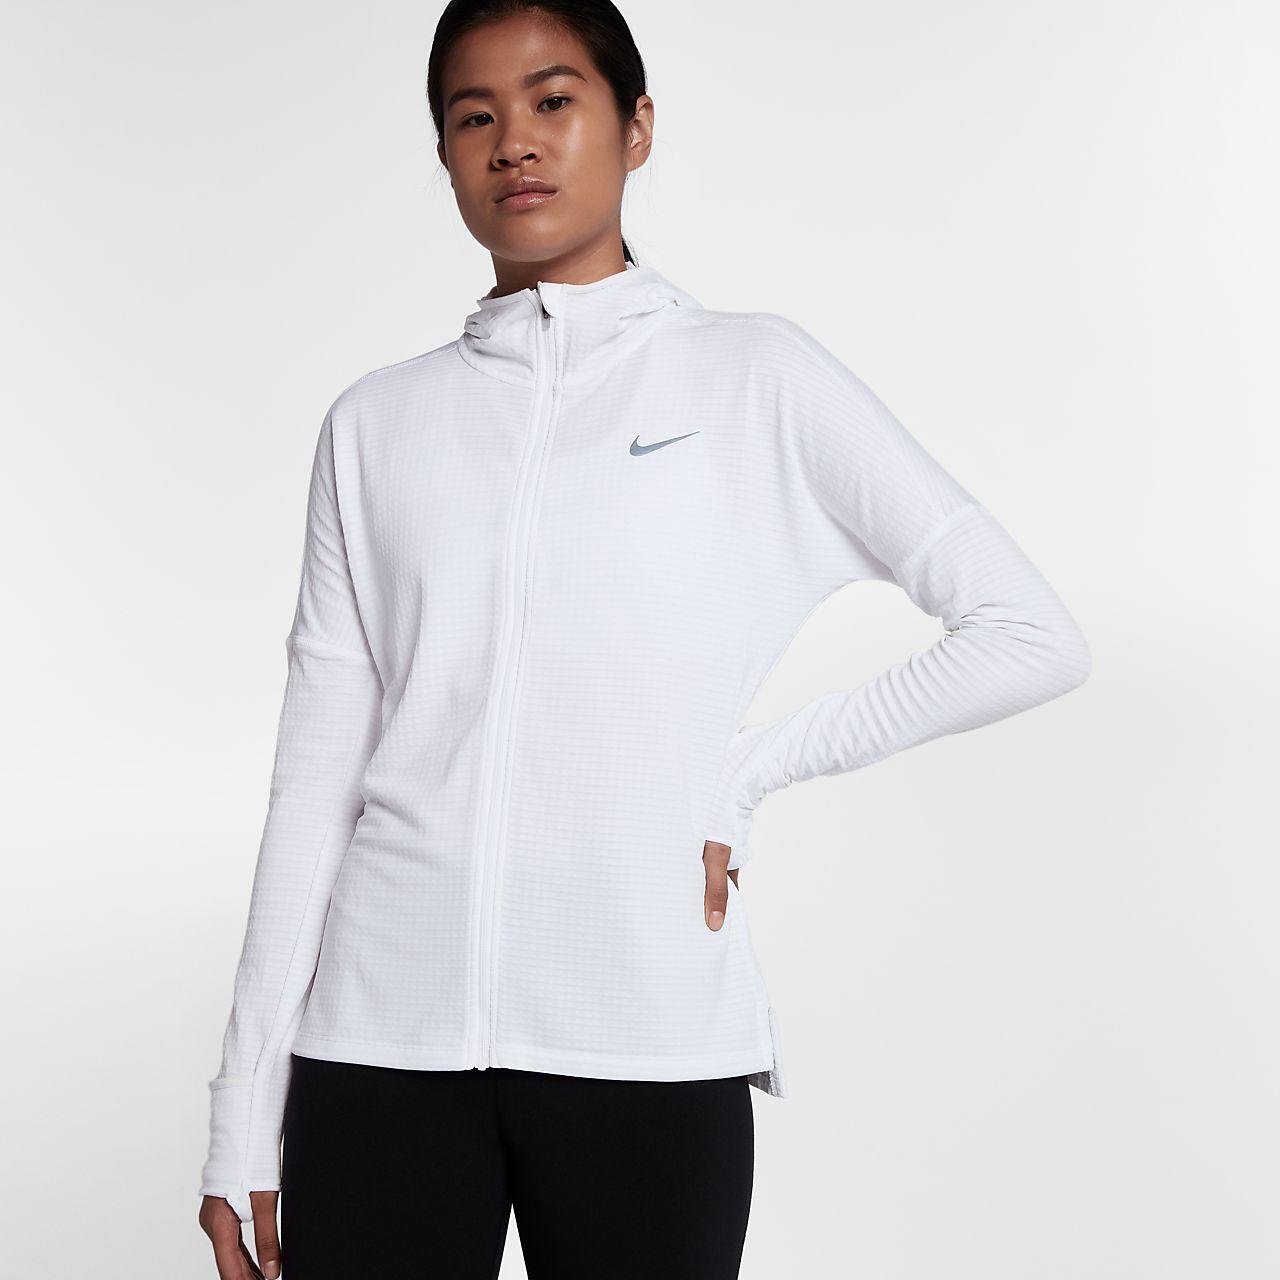 Women's Vest - Nike Pro Hyperwarm Half-Zip - White/Black : M12h5838